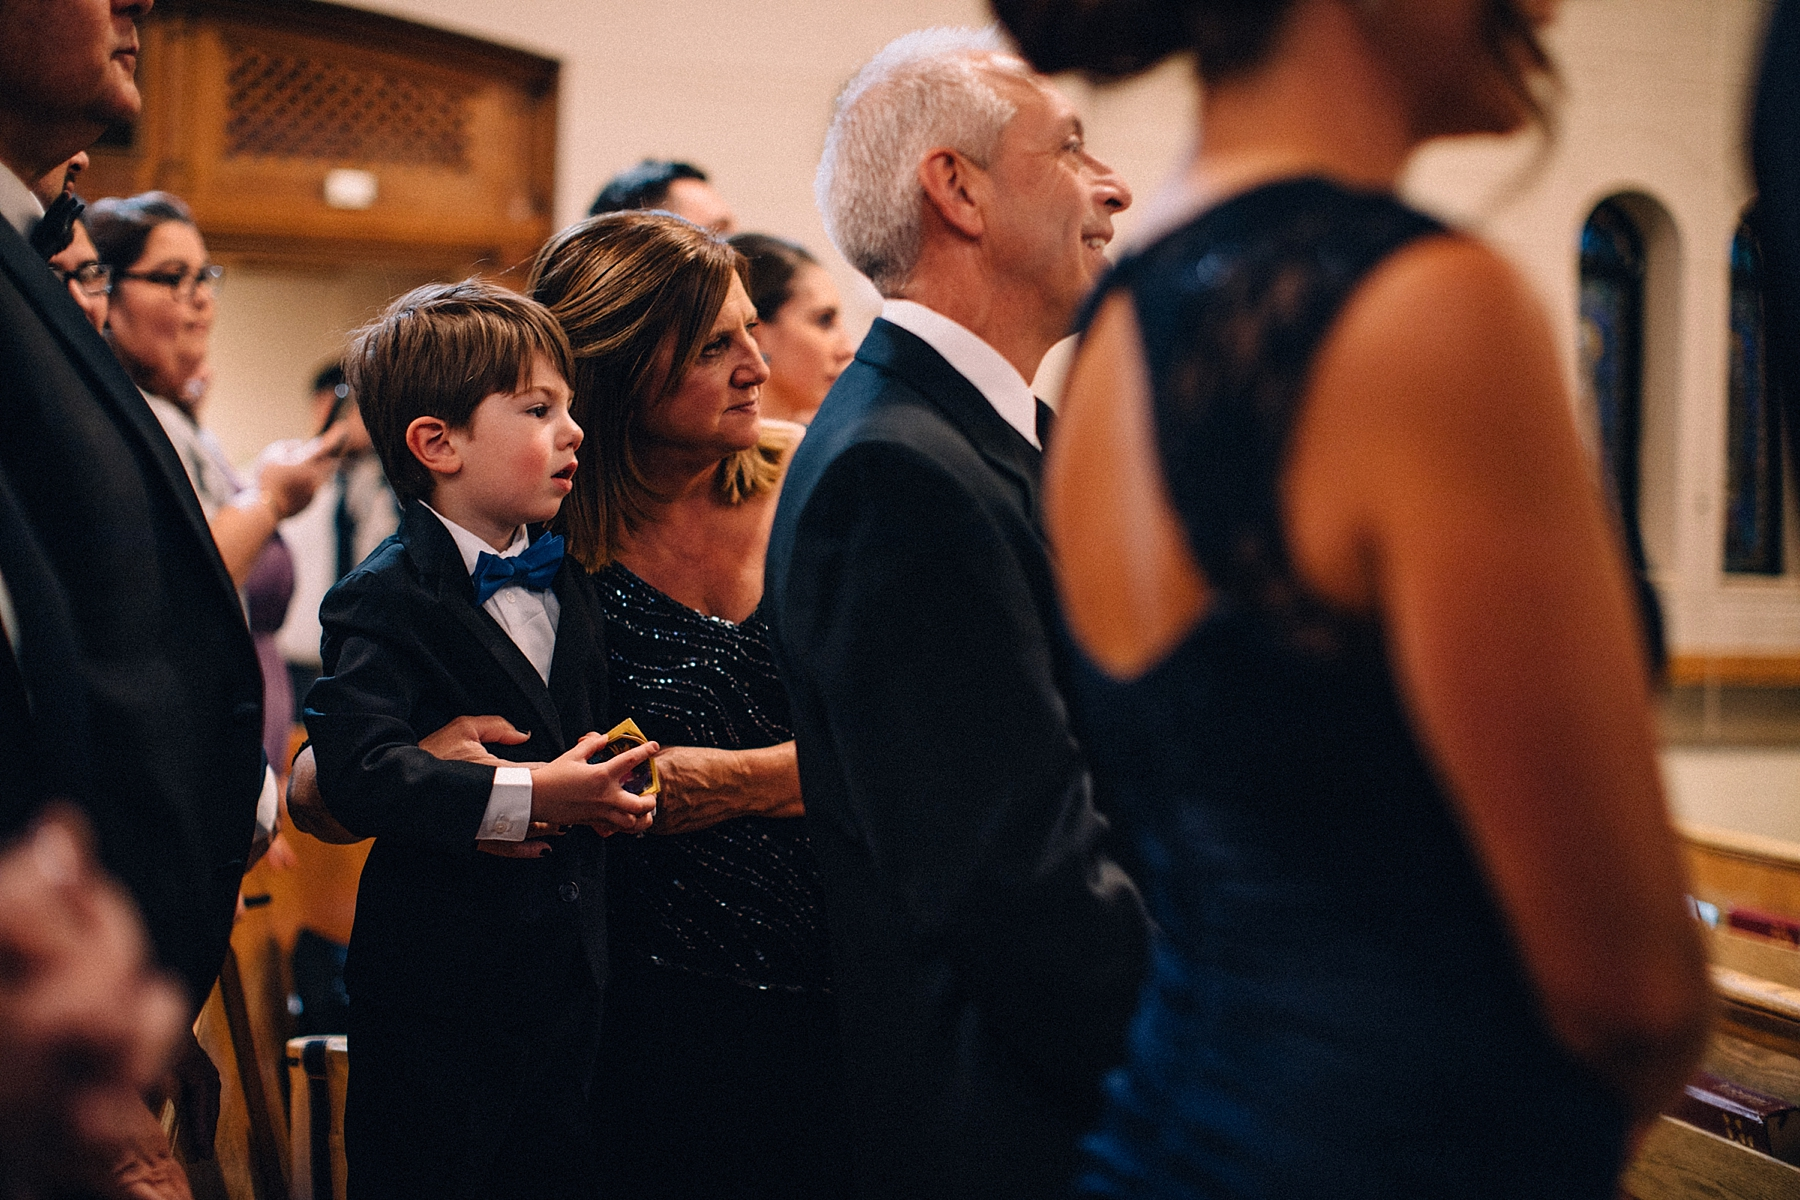 cranford-washington-nj-wedding-photographer-seasons_0015.jpg